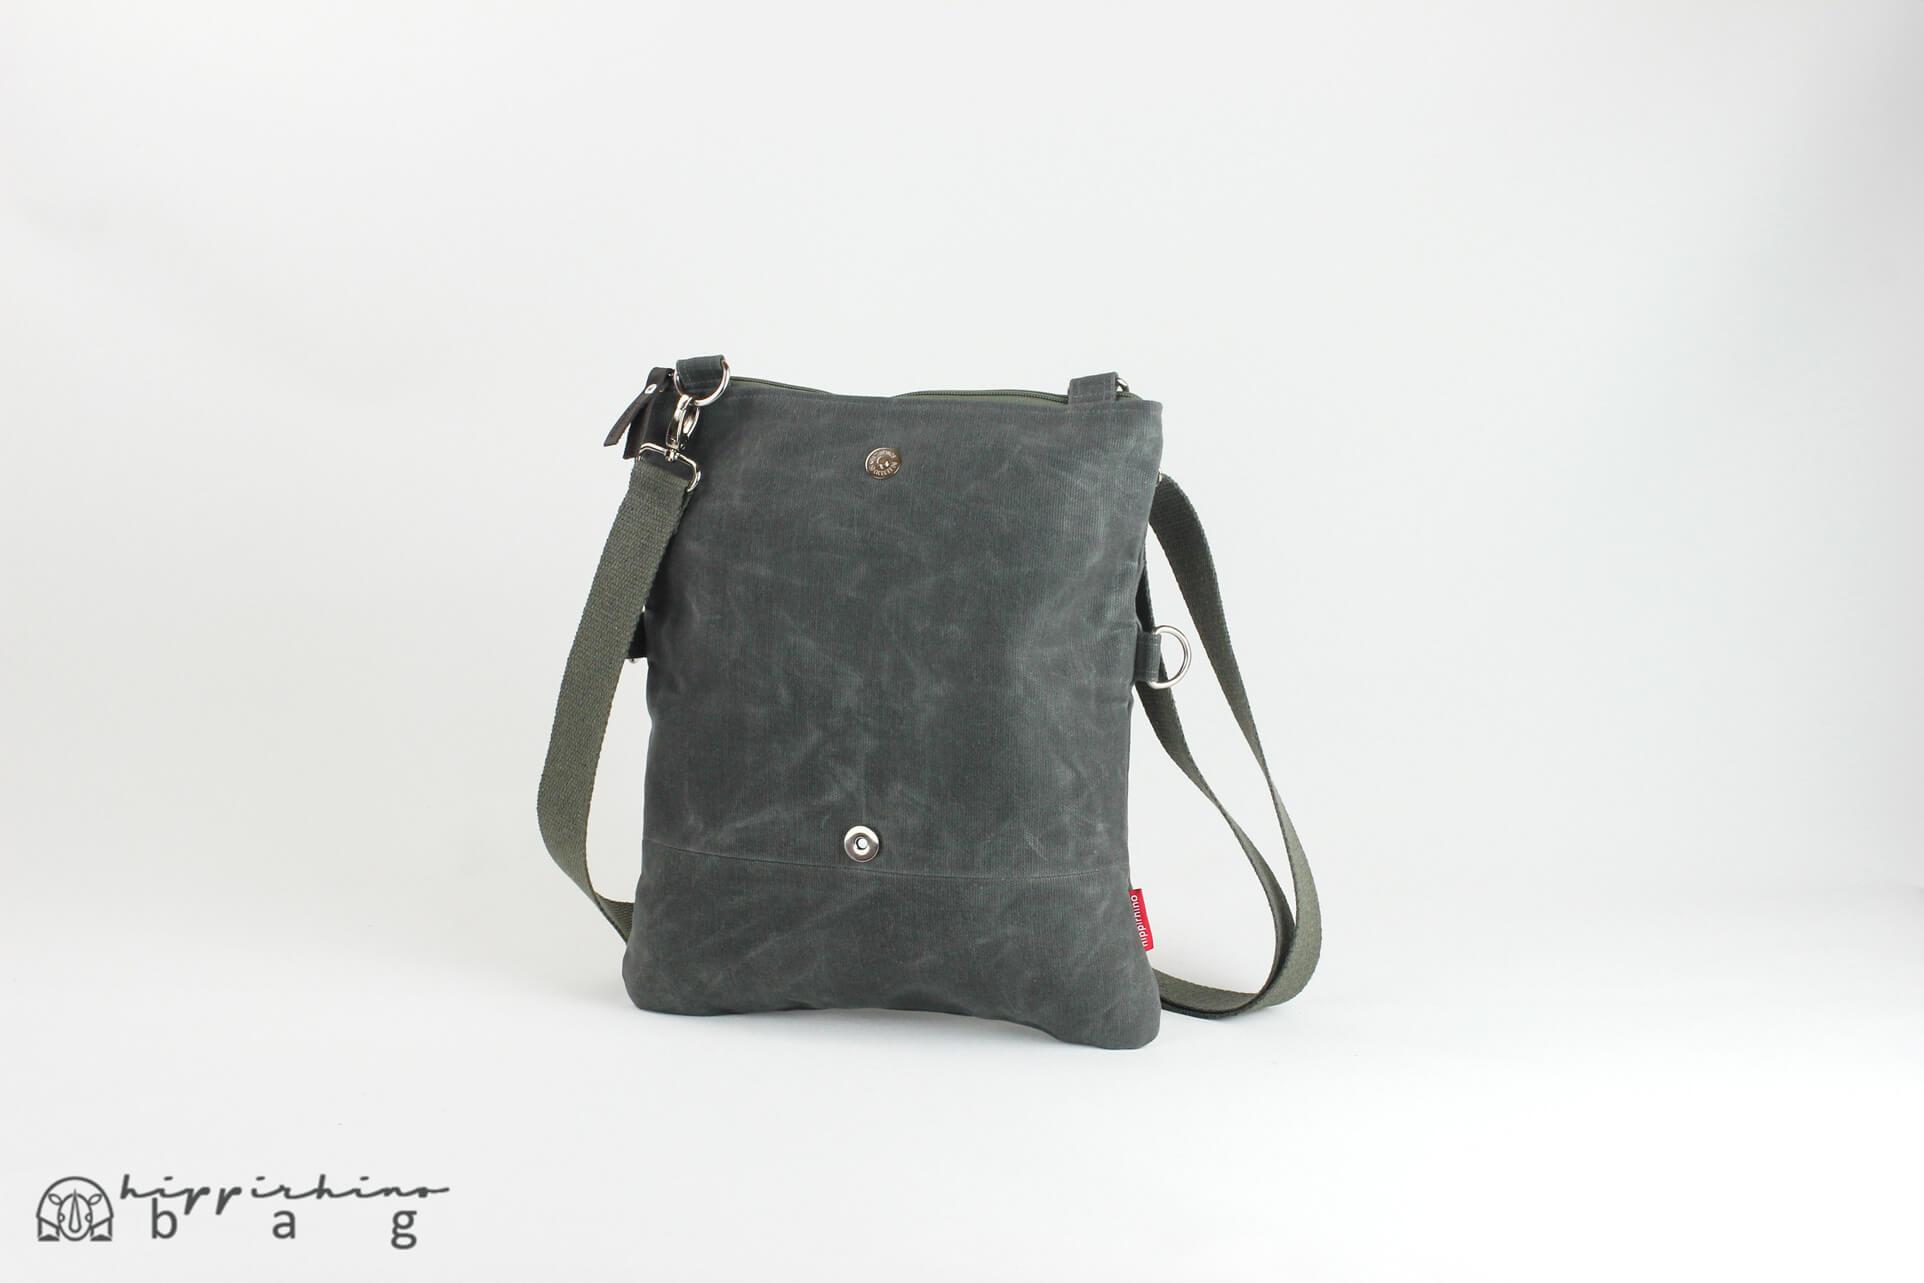 10c97a6a9b0e Grey waxed folded clutch small bag crossbody shoulder bag waterproof ...